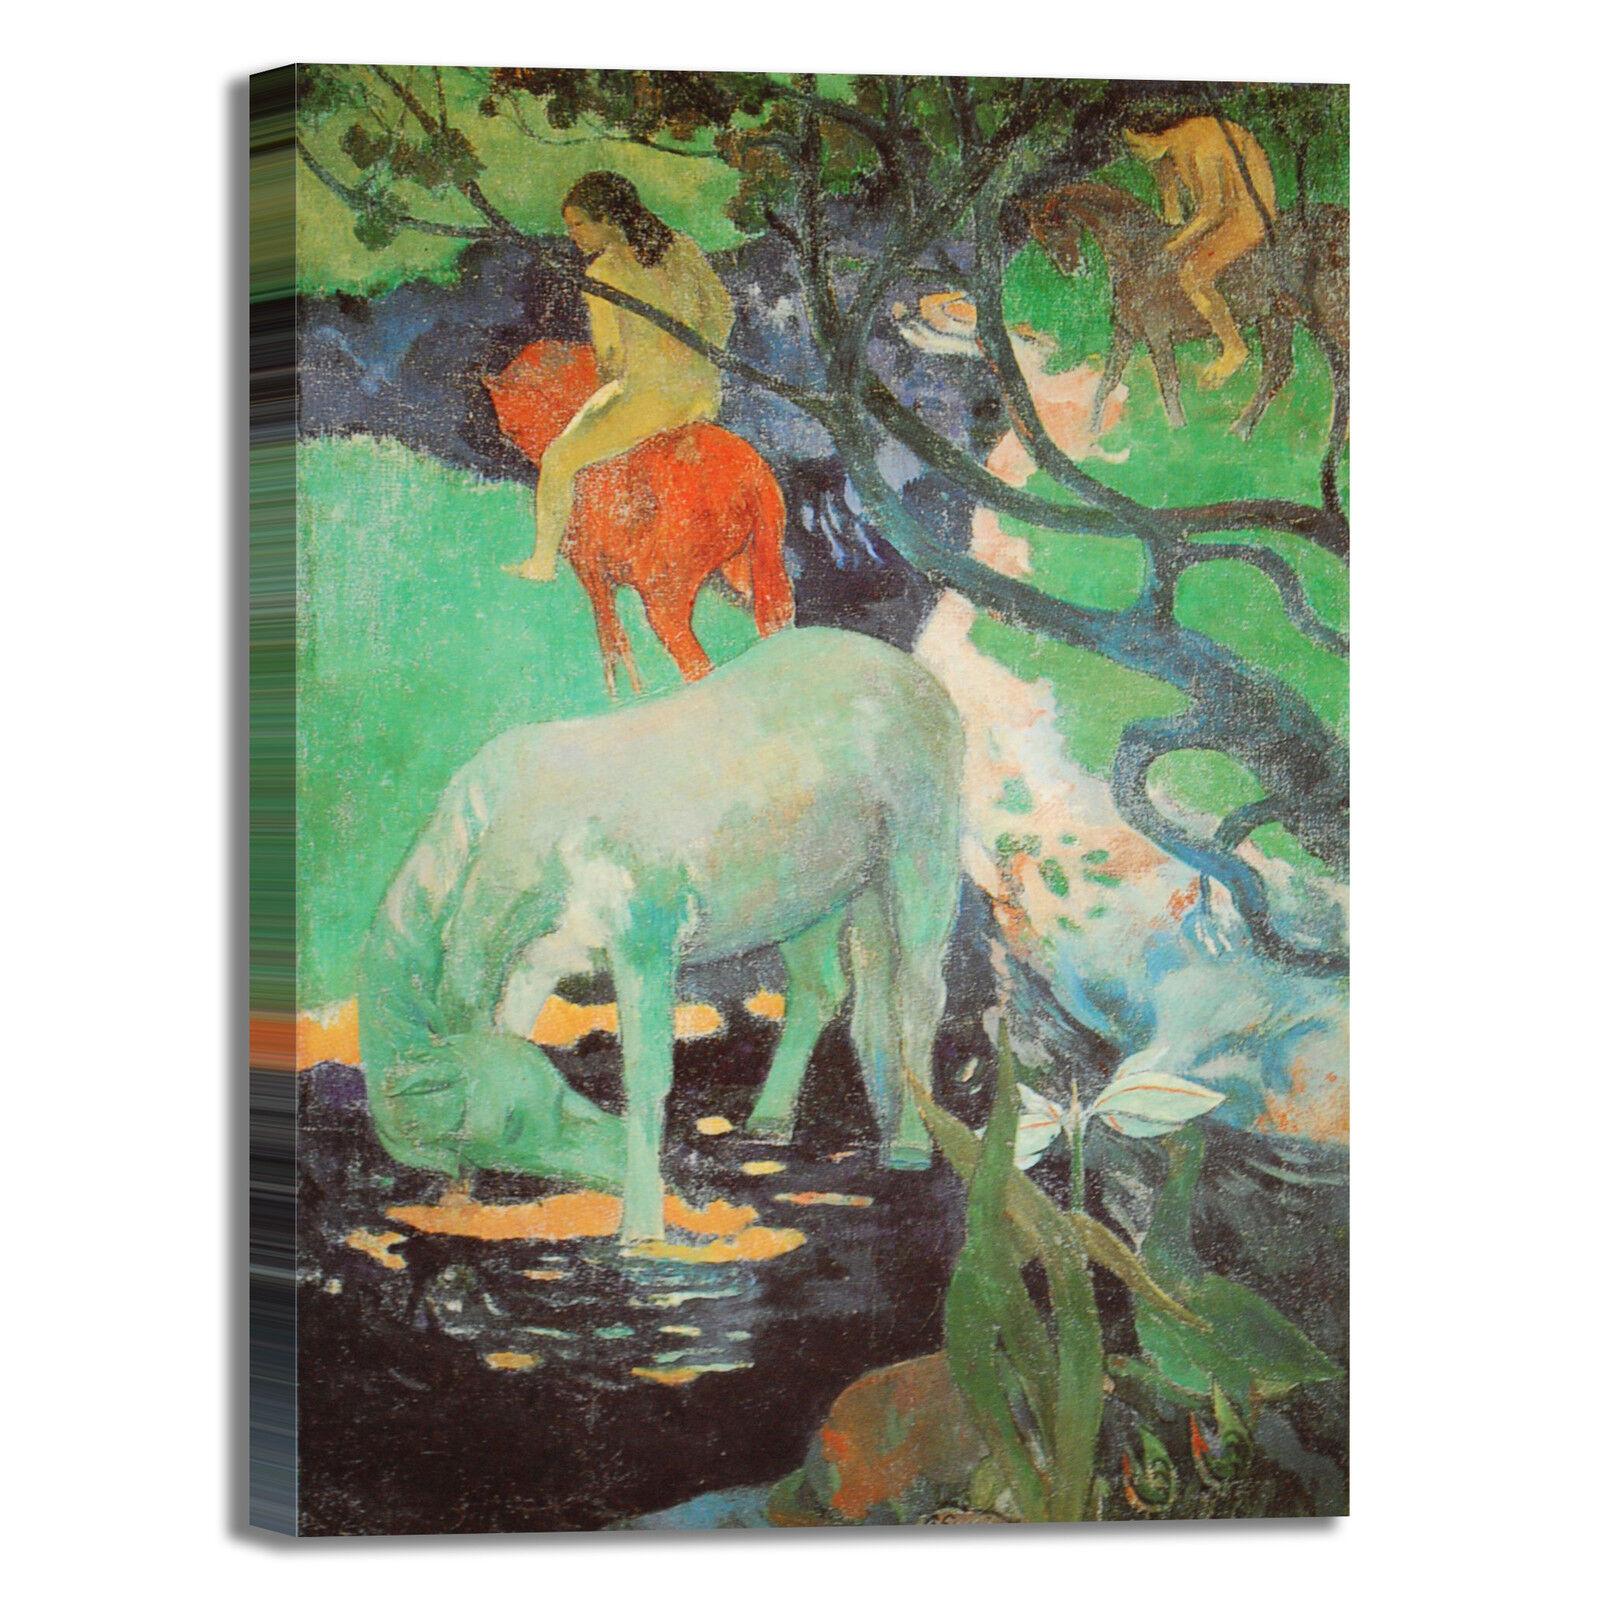 Gauguin bianco cavallo bianco Gauguin design quadro stampa tela dipinto telaio arRouge o casa 672747